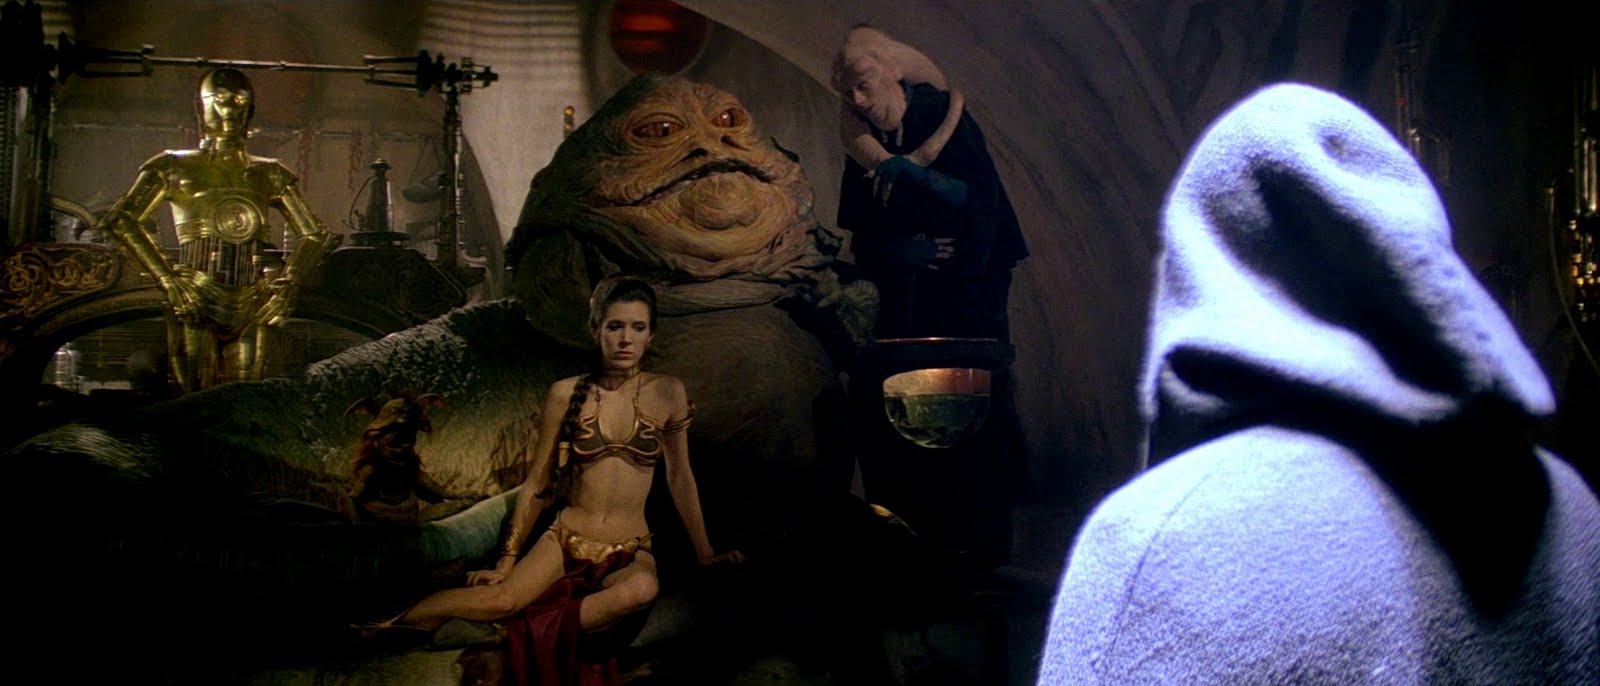 tesess: My Top Ten Worst Star Wars Characters #4: Jabba ... Jabba The Hutt Choked